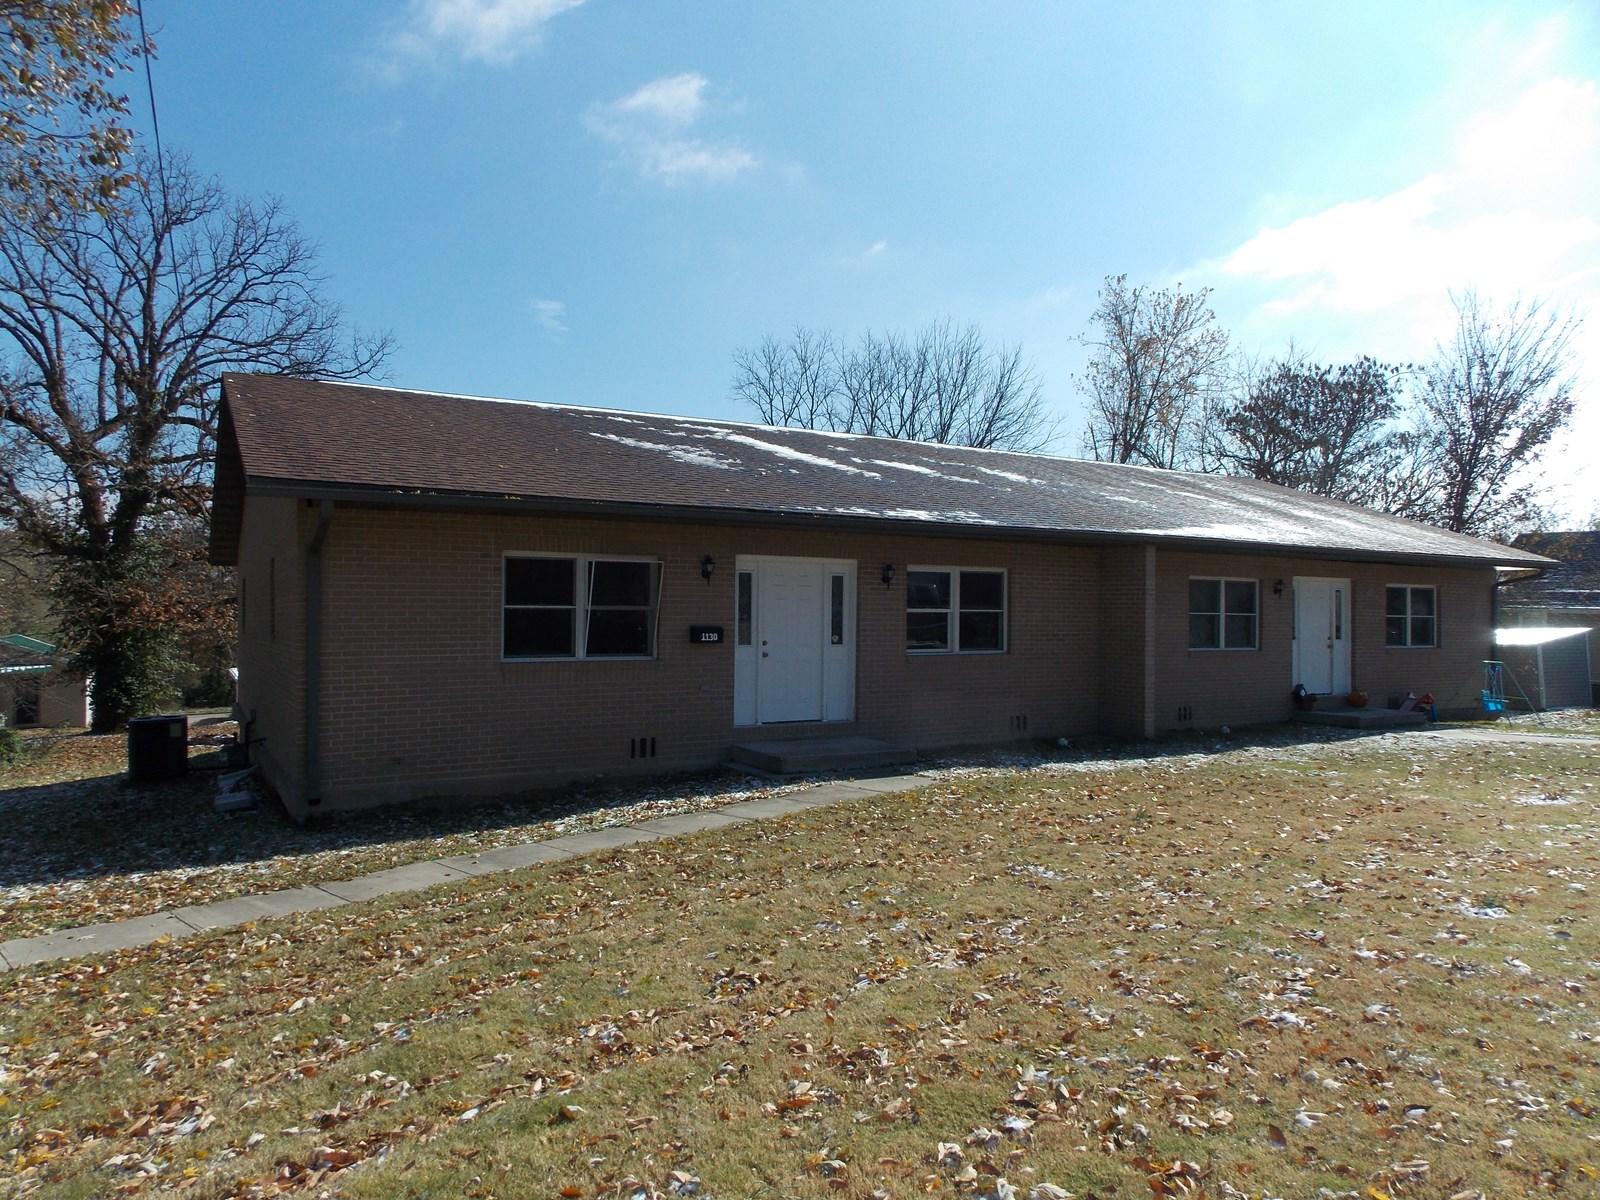 Brick Duplex for sale in West Plains Missouri